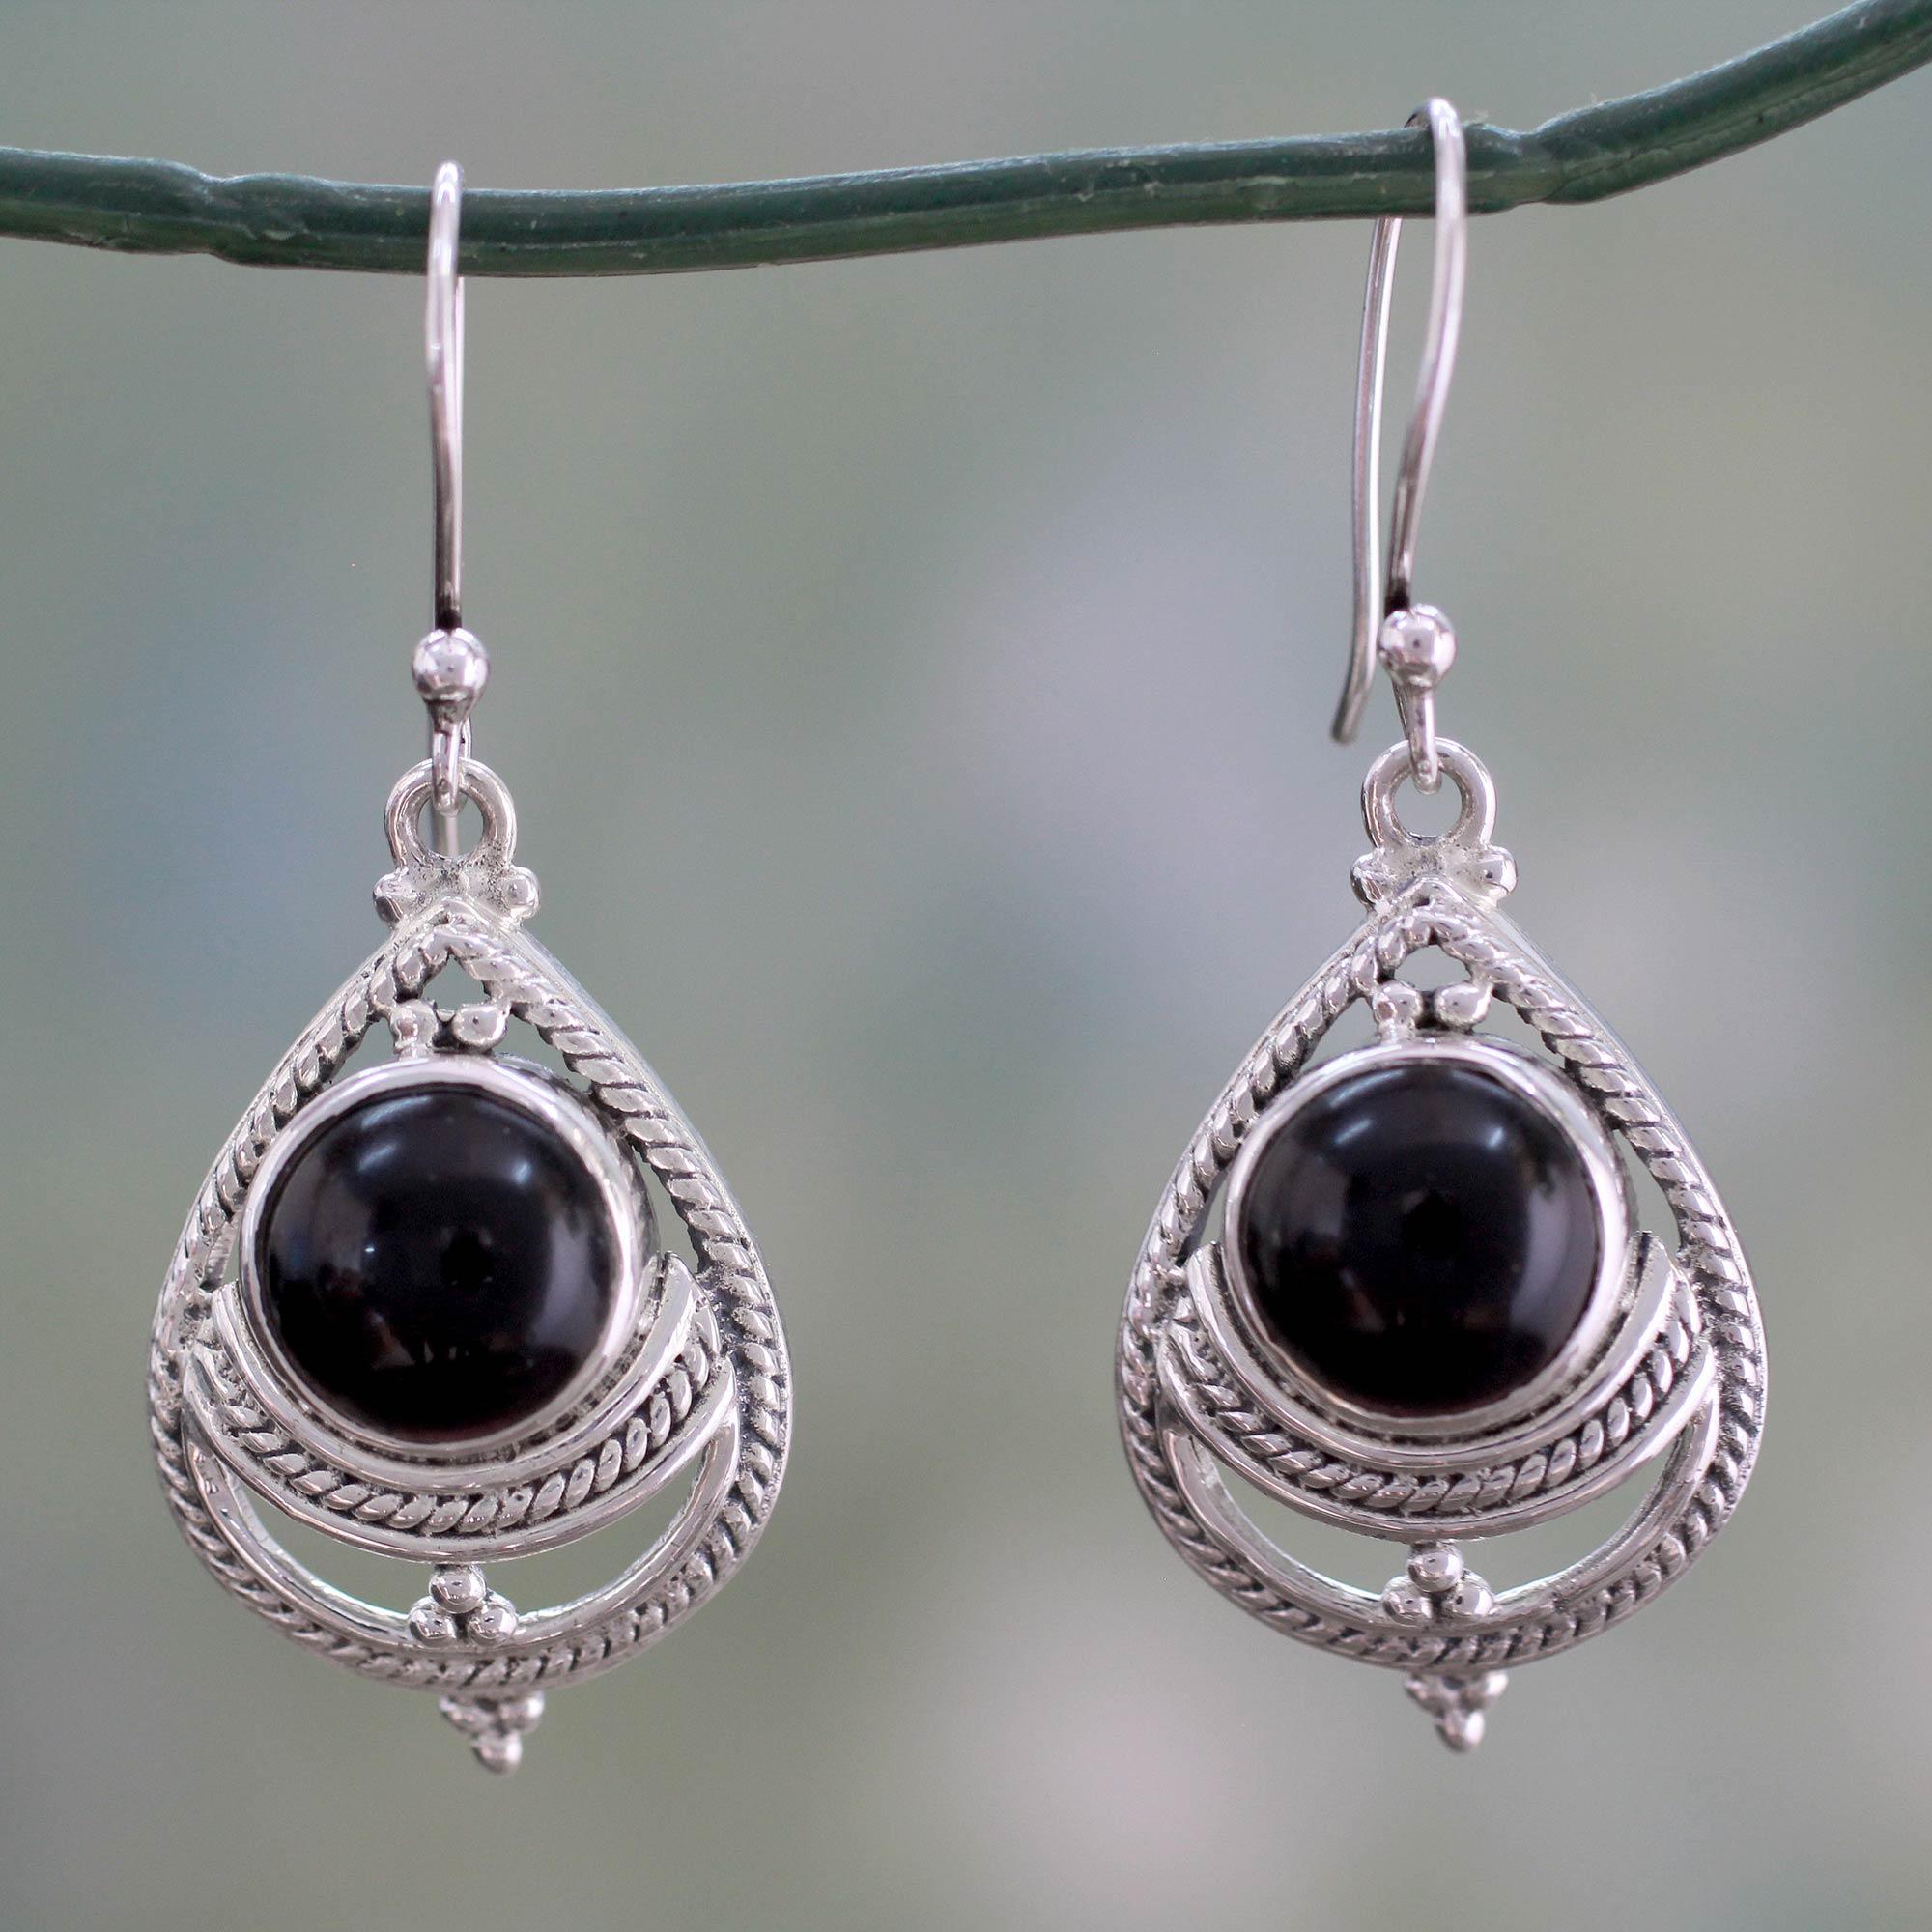 unicef uk market onyx earrings handmade with sterling